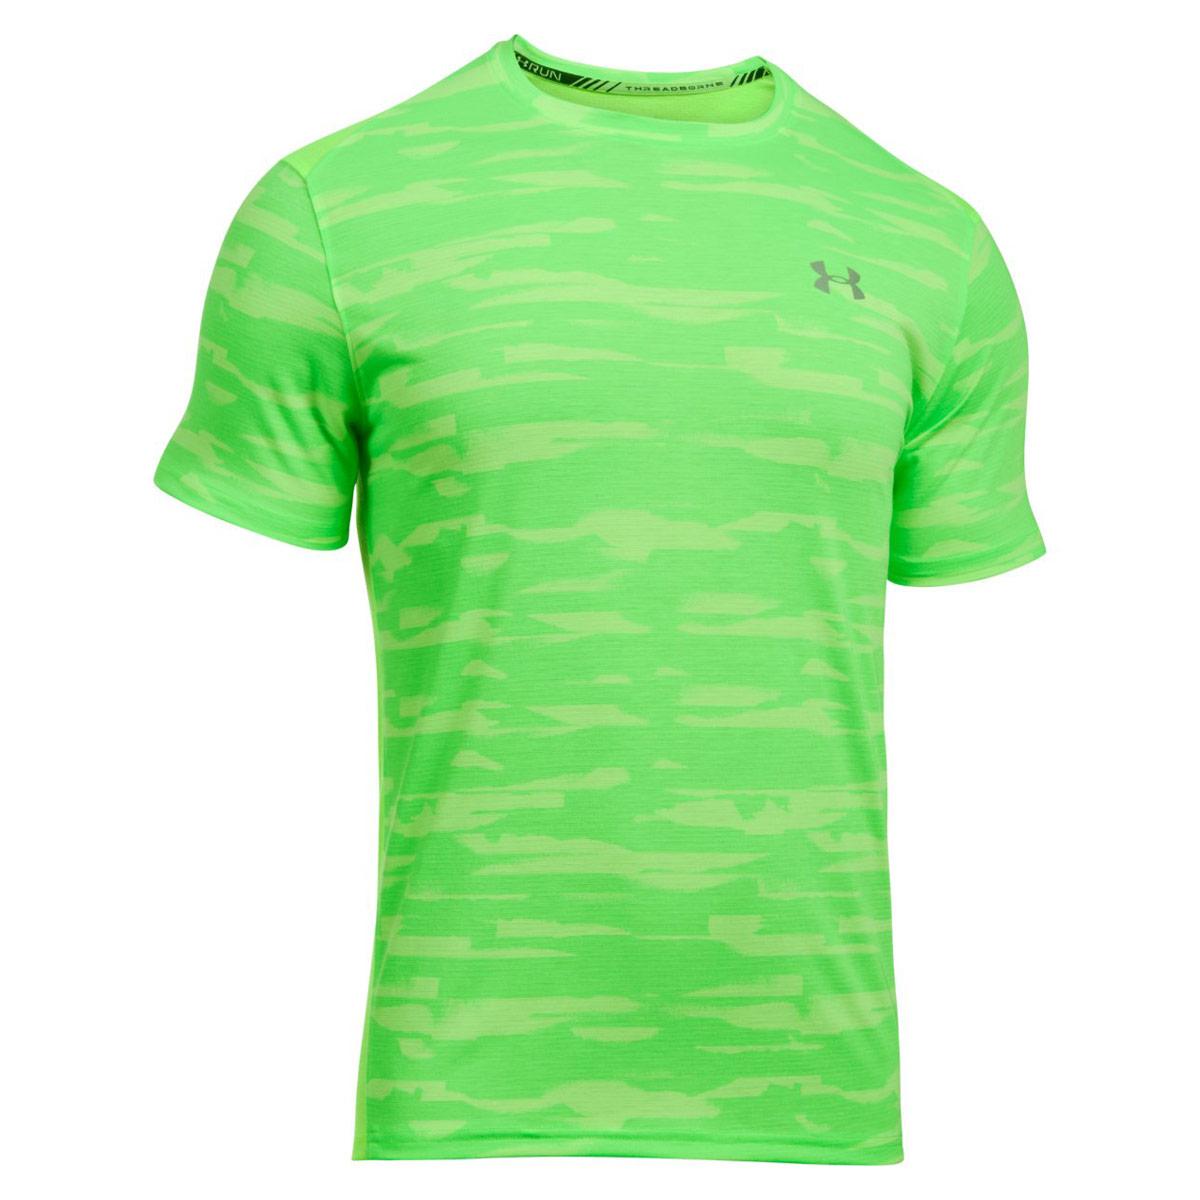 5438ea8c8f Under Armour Threadborne Run Mesh Short Sleeve - Running tops for Men -  Green